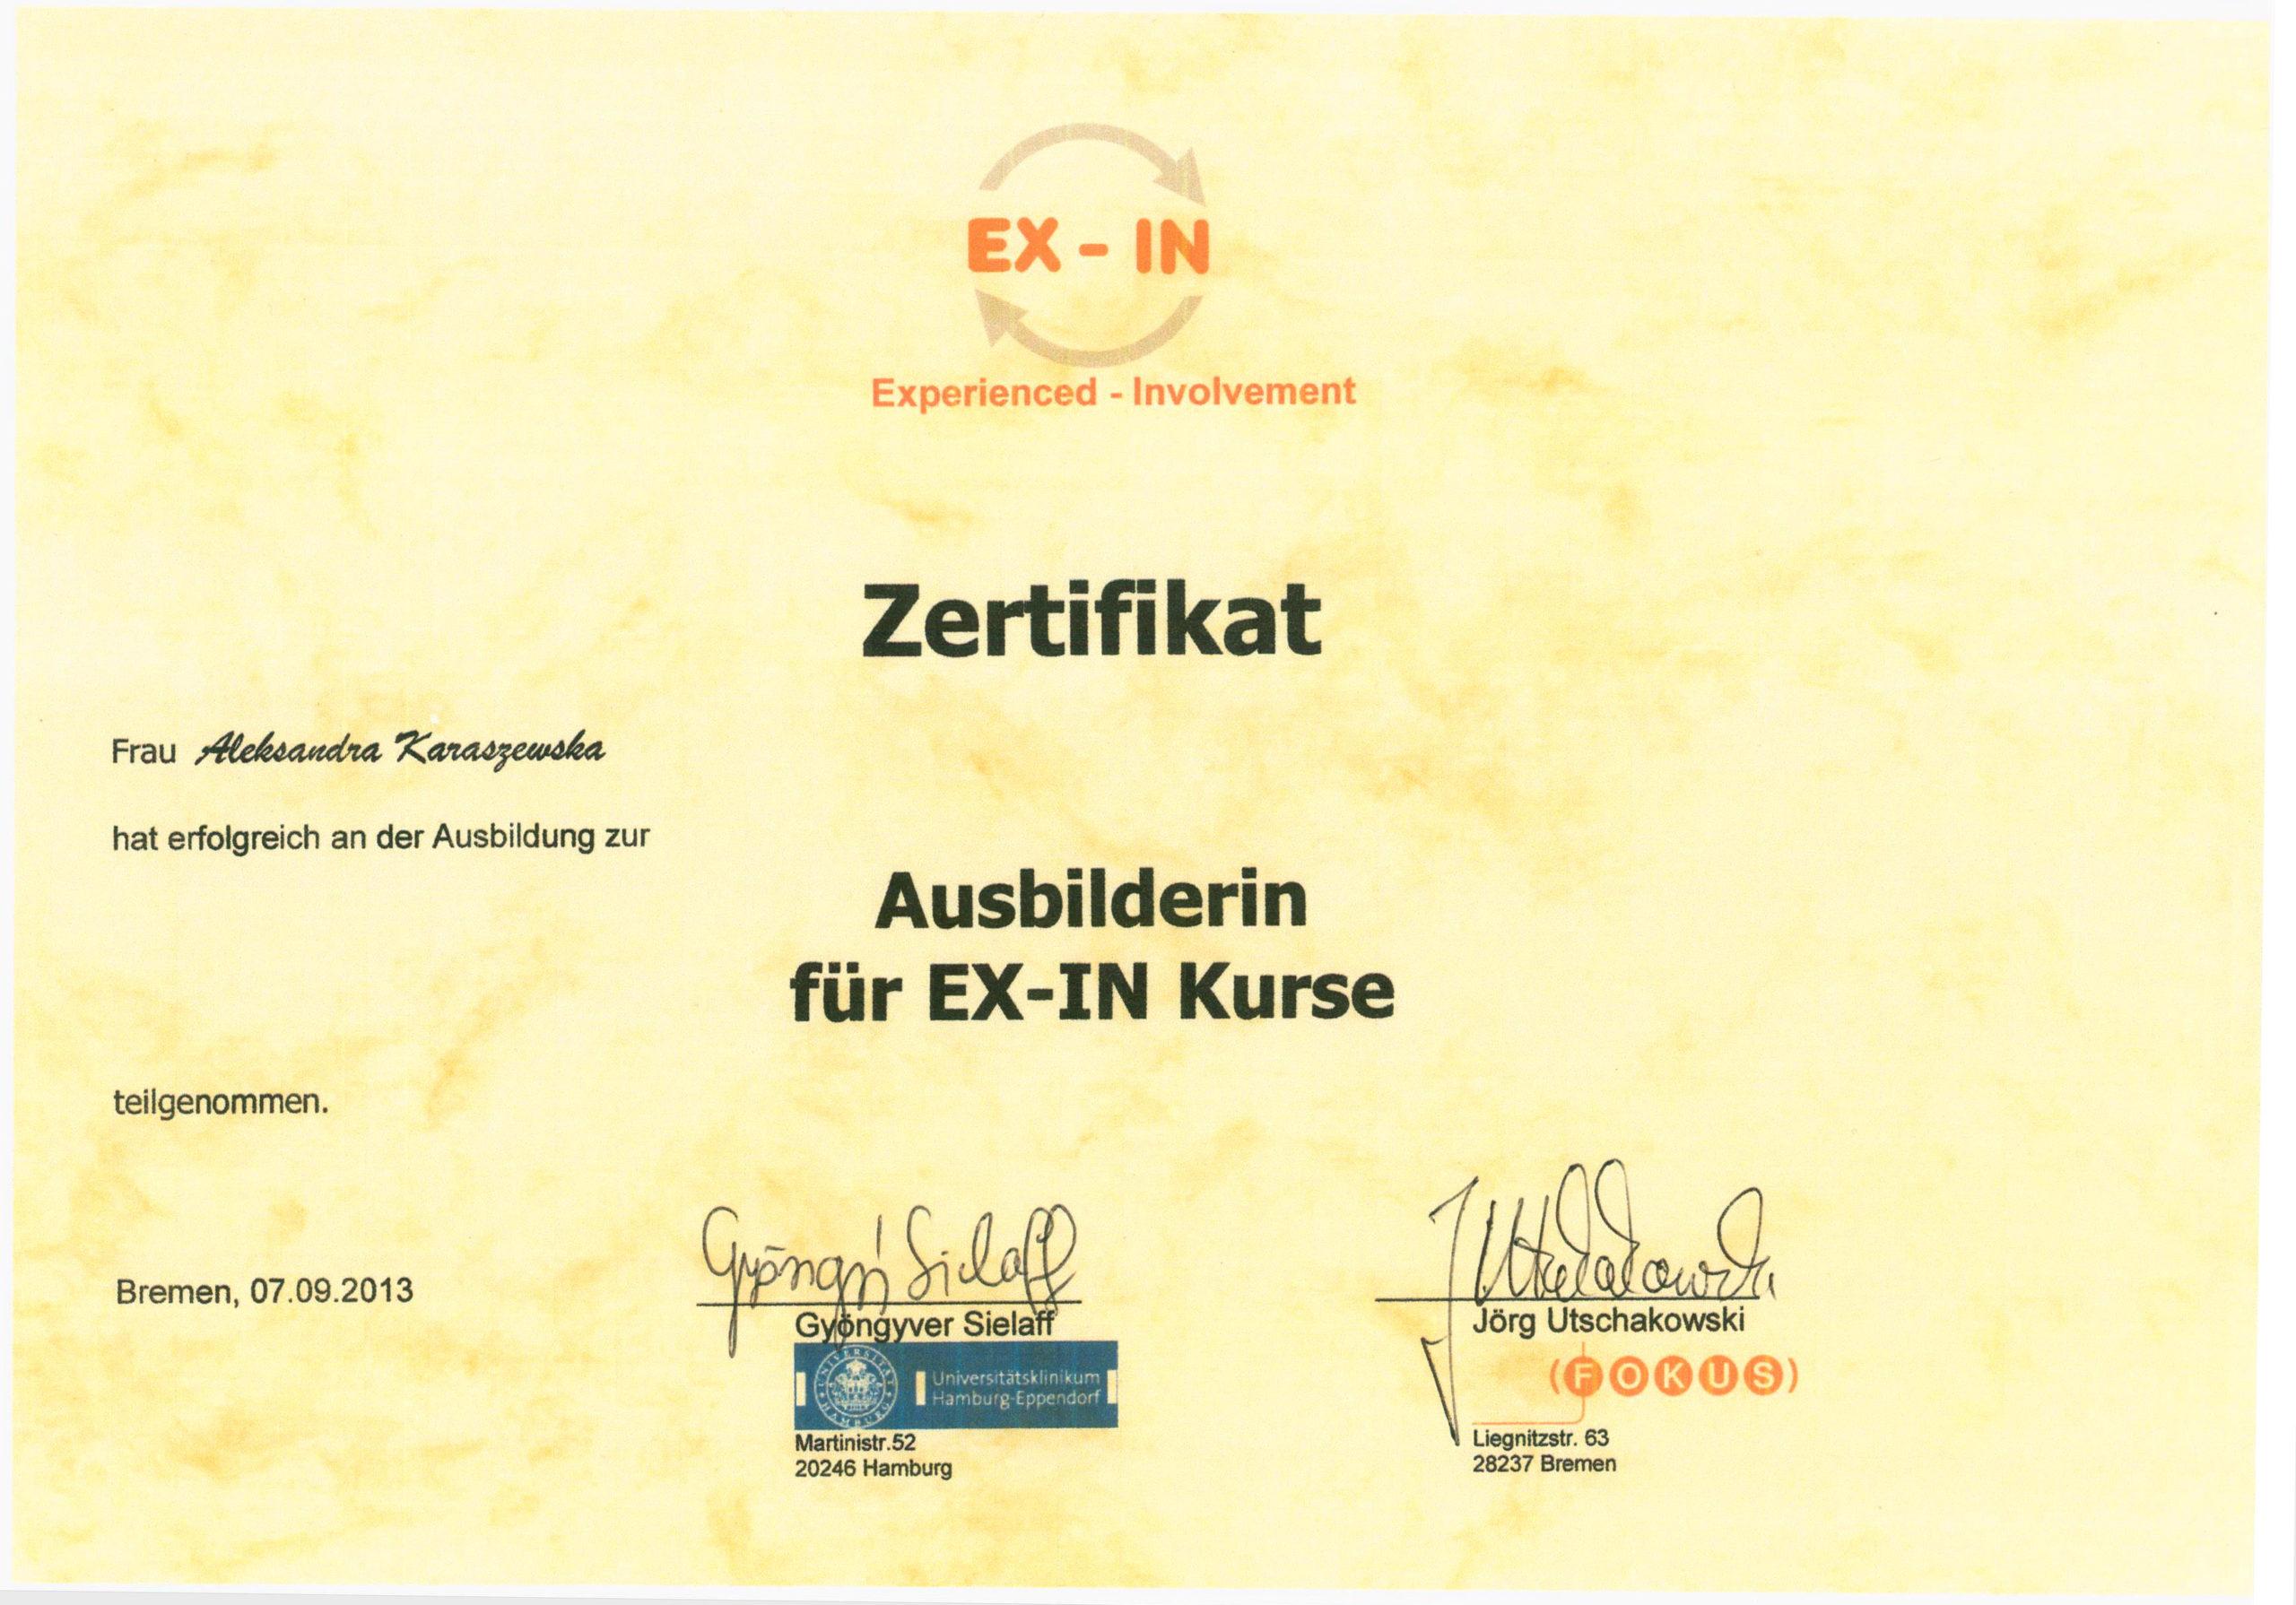 EX-IN Kurse